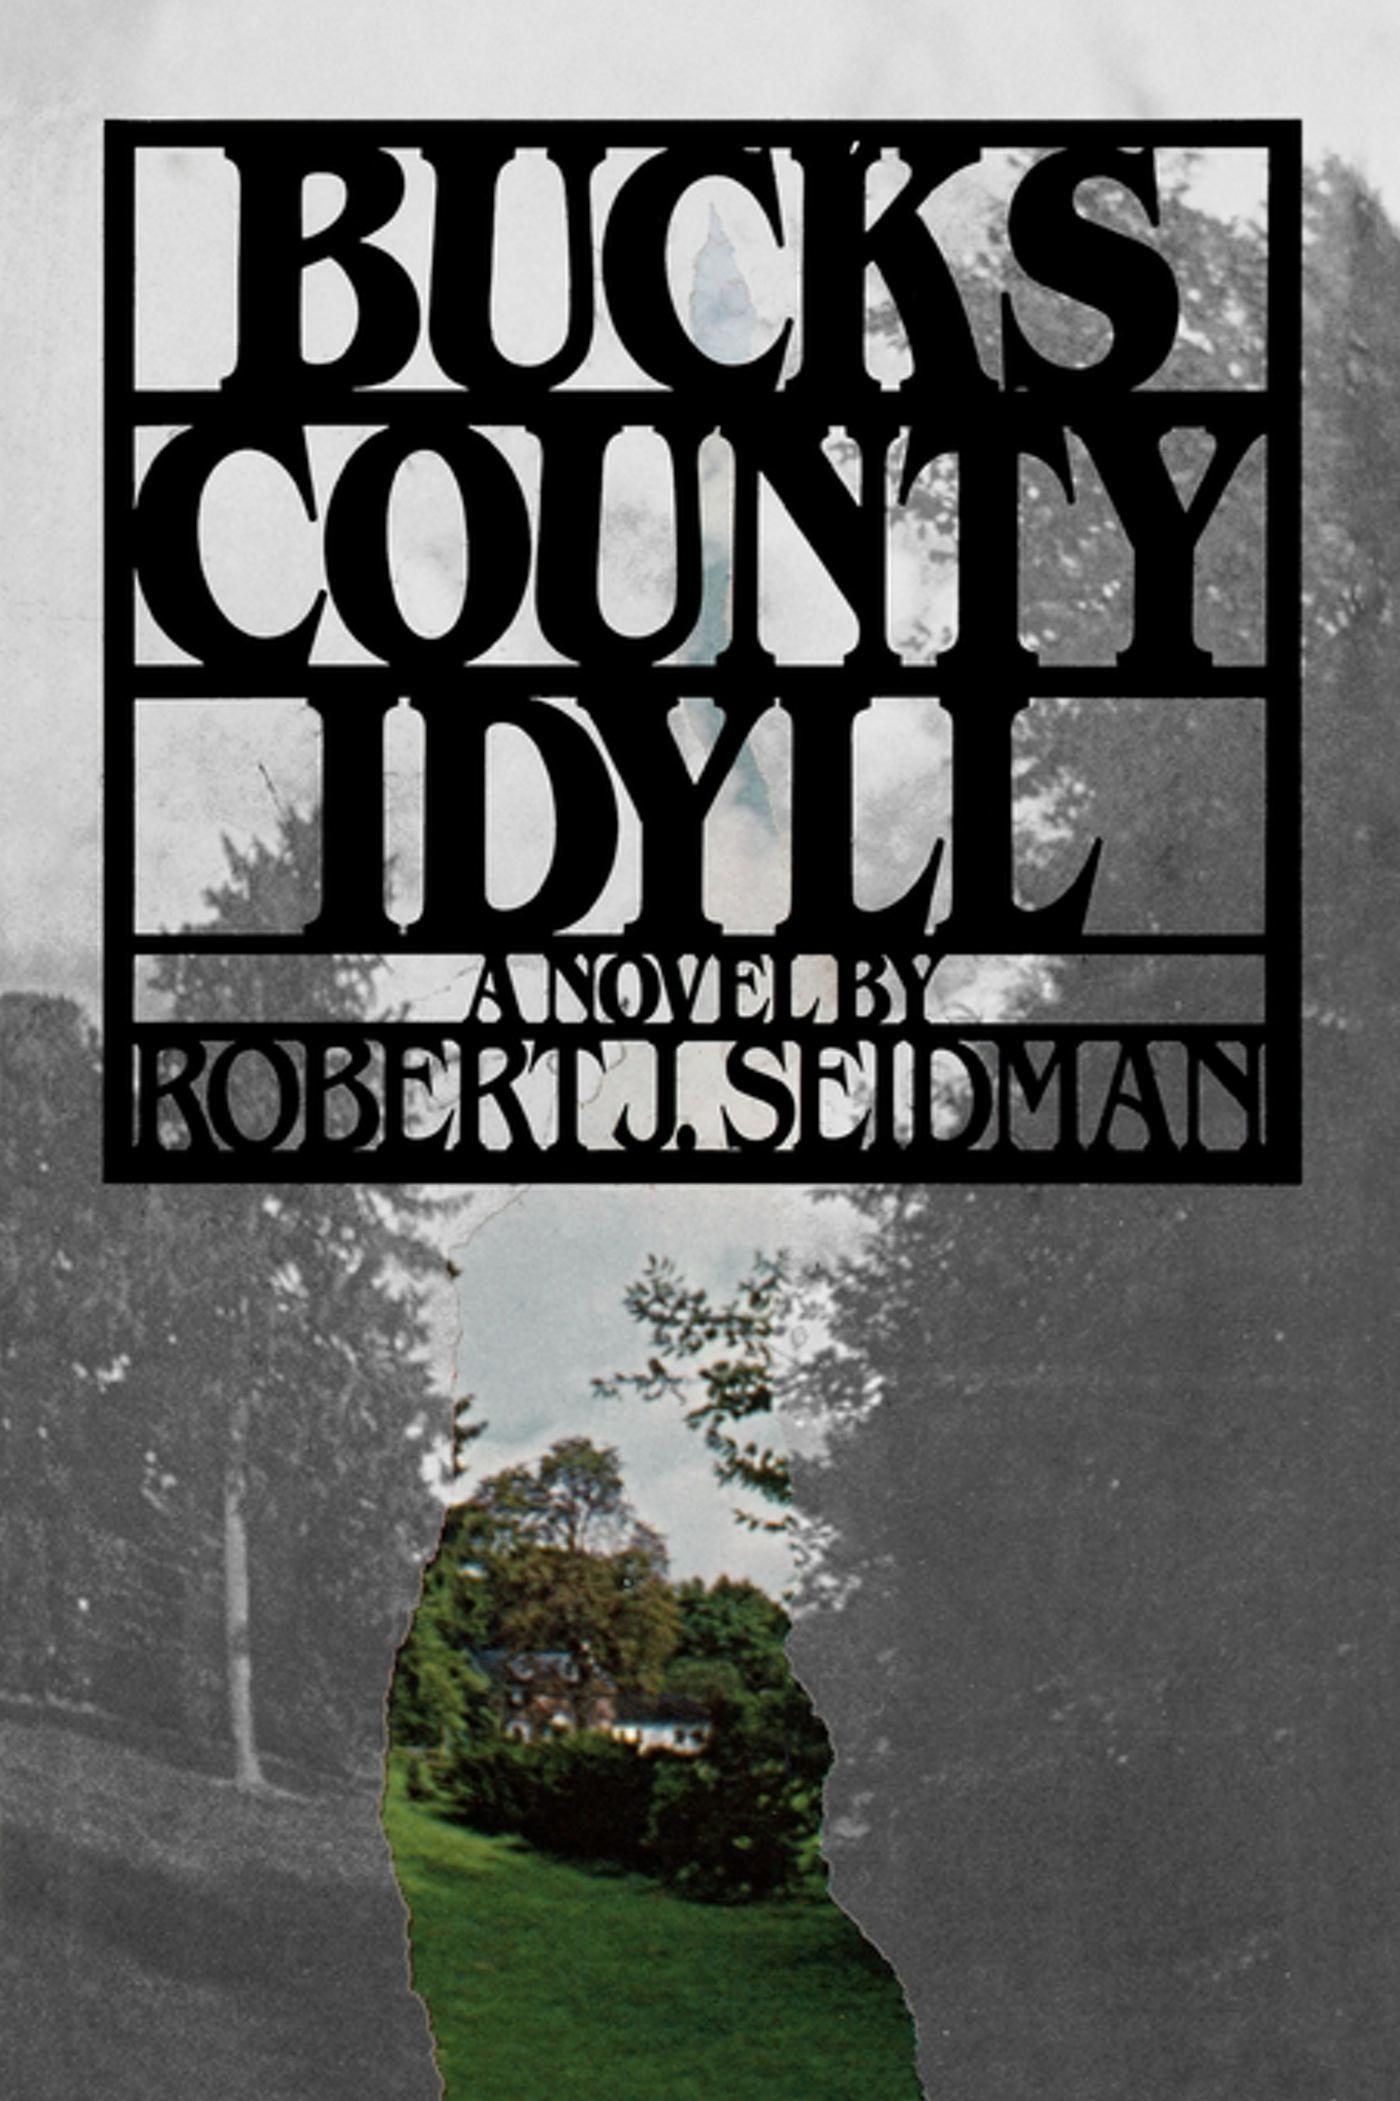 Bucks county idyll 9781439183250 hr